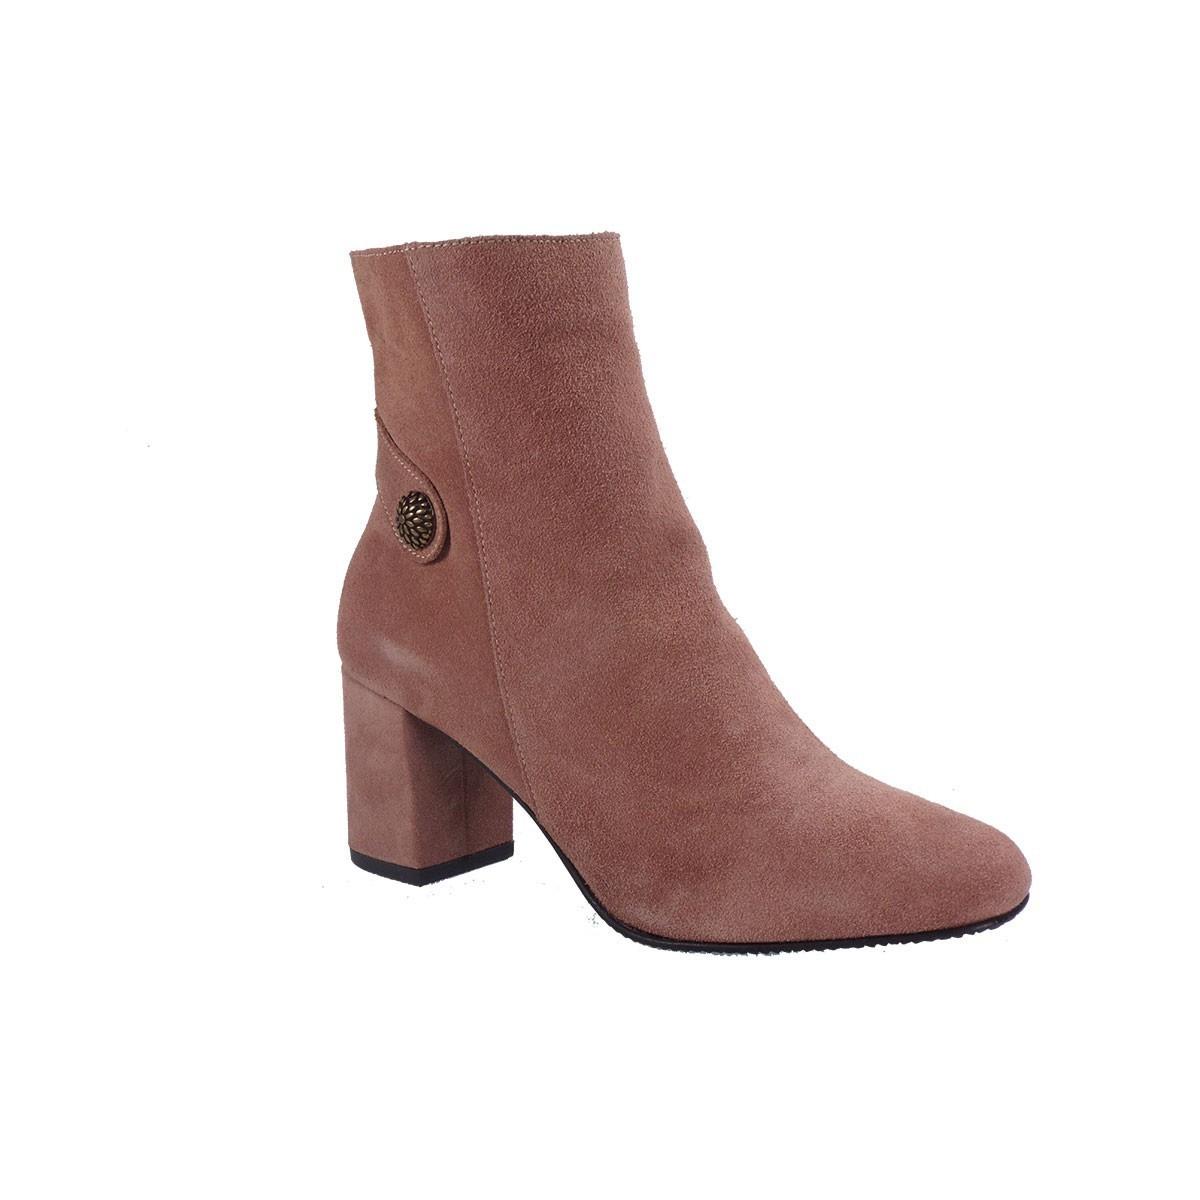 Fardoulis Shoes Γυναικεία Παπούτσια Μποτάκια 1606 Nude Kαστόρι